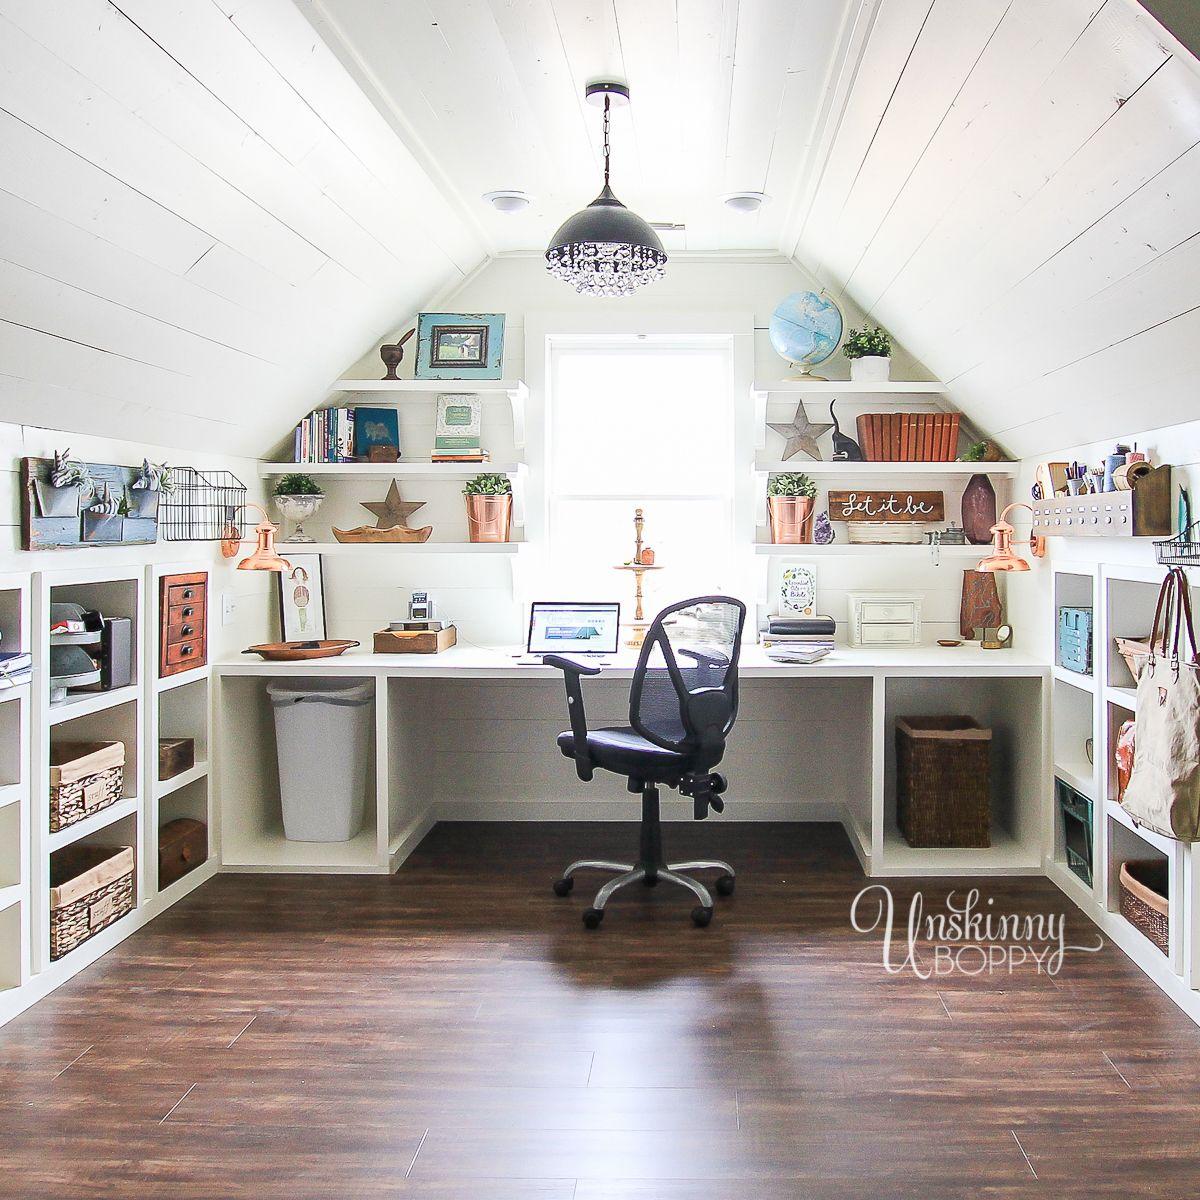 Amazing Office Craft Room Organization In The Attic